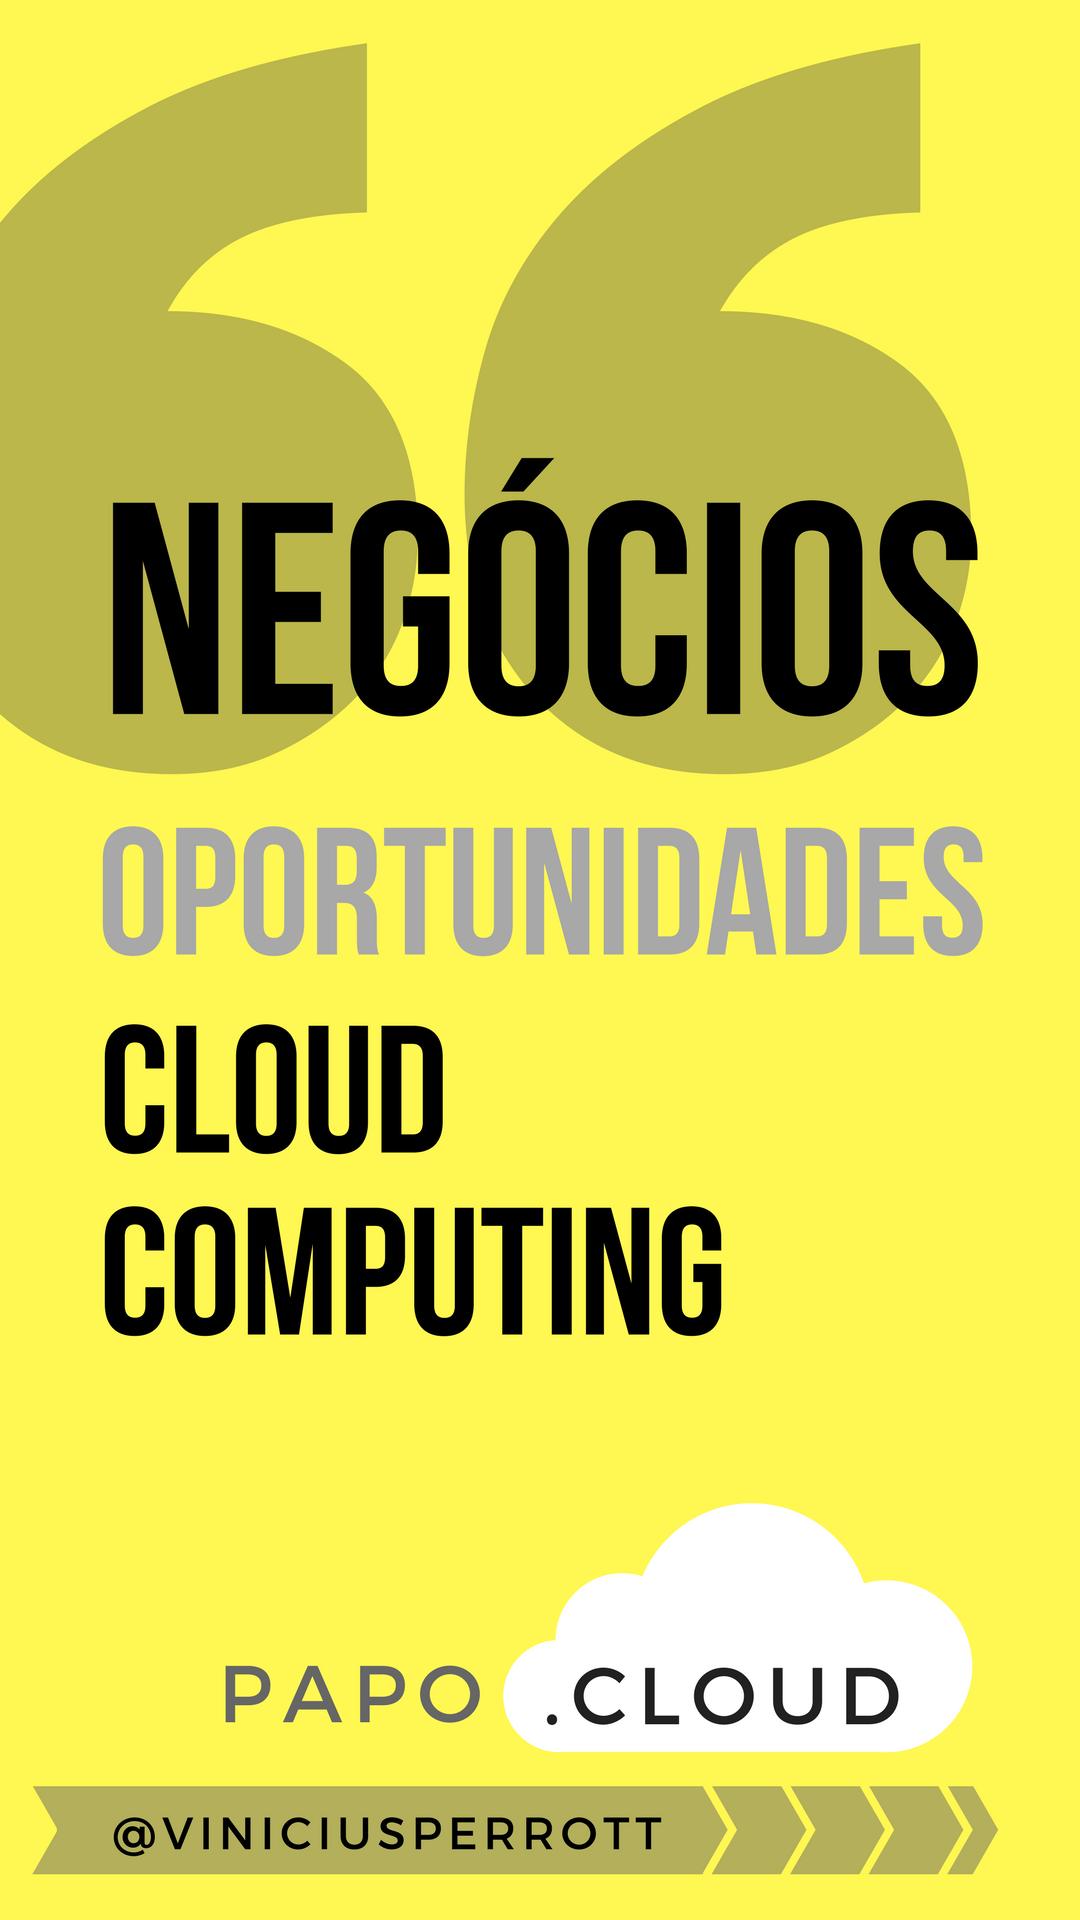 Papo.cloud